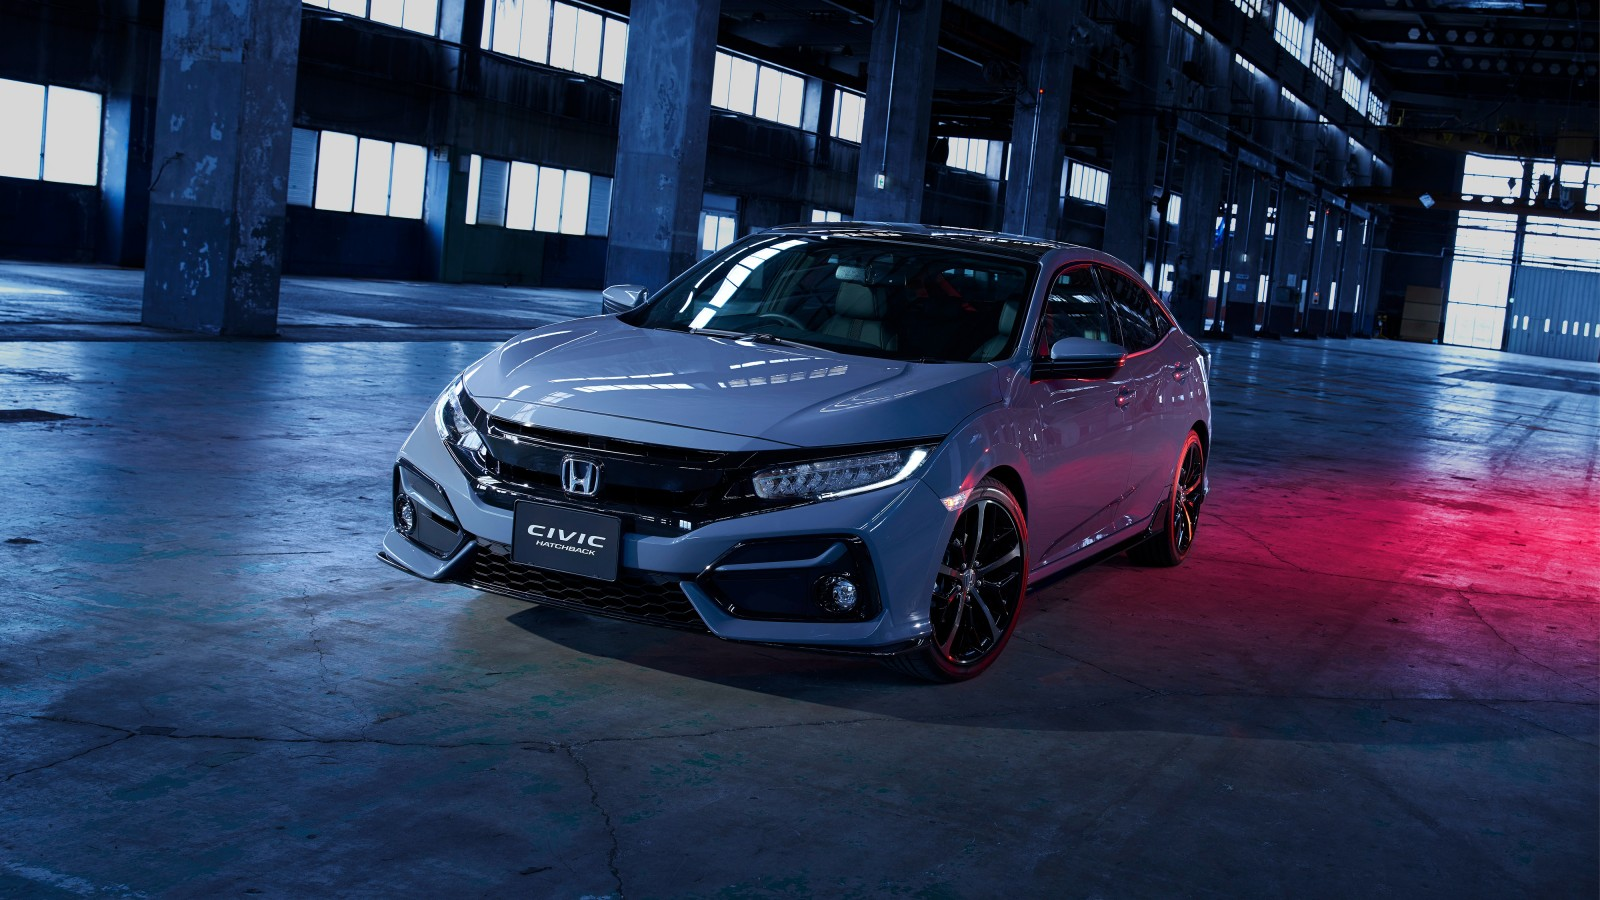 Honda Civic Hatchback 2019 4K 2 Wallpaper | HD Car ...